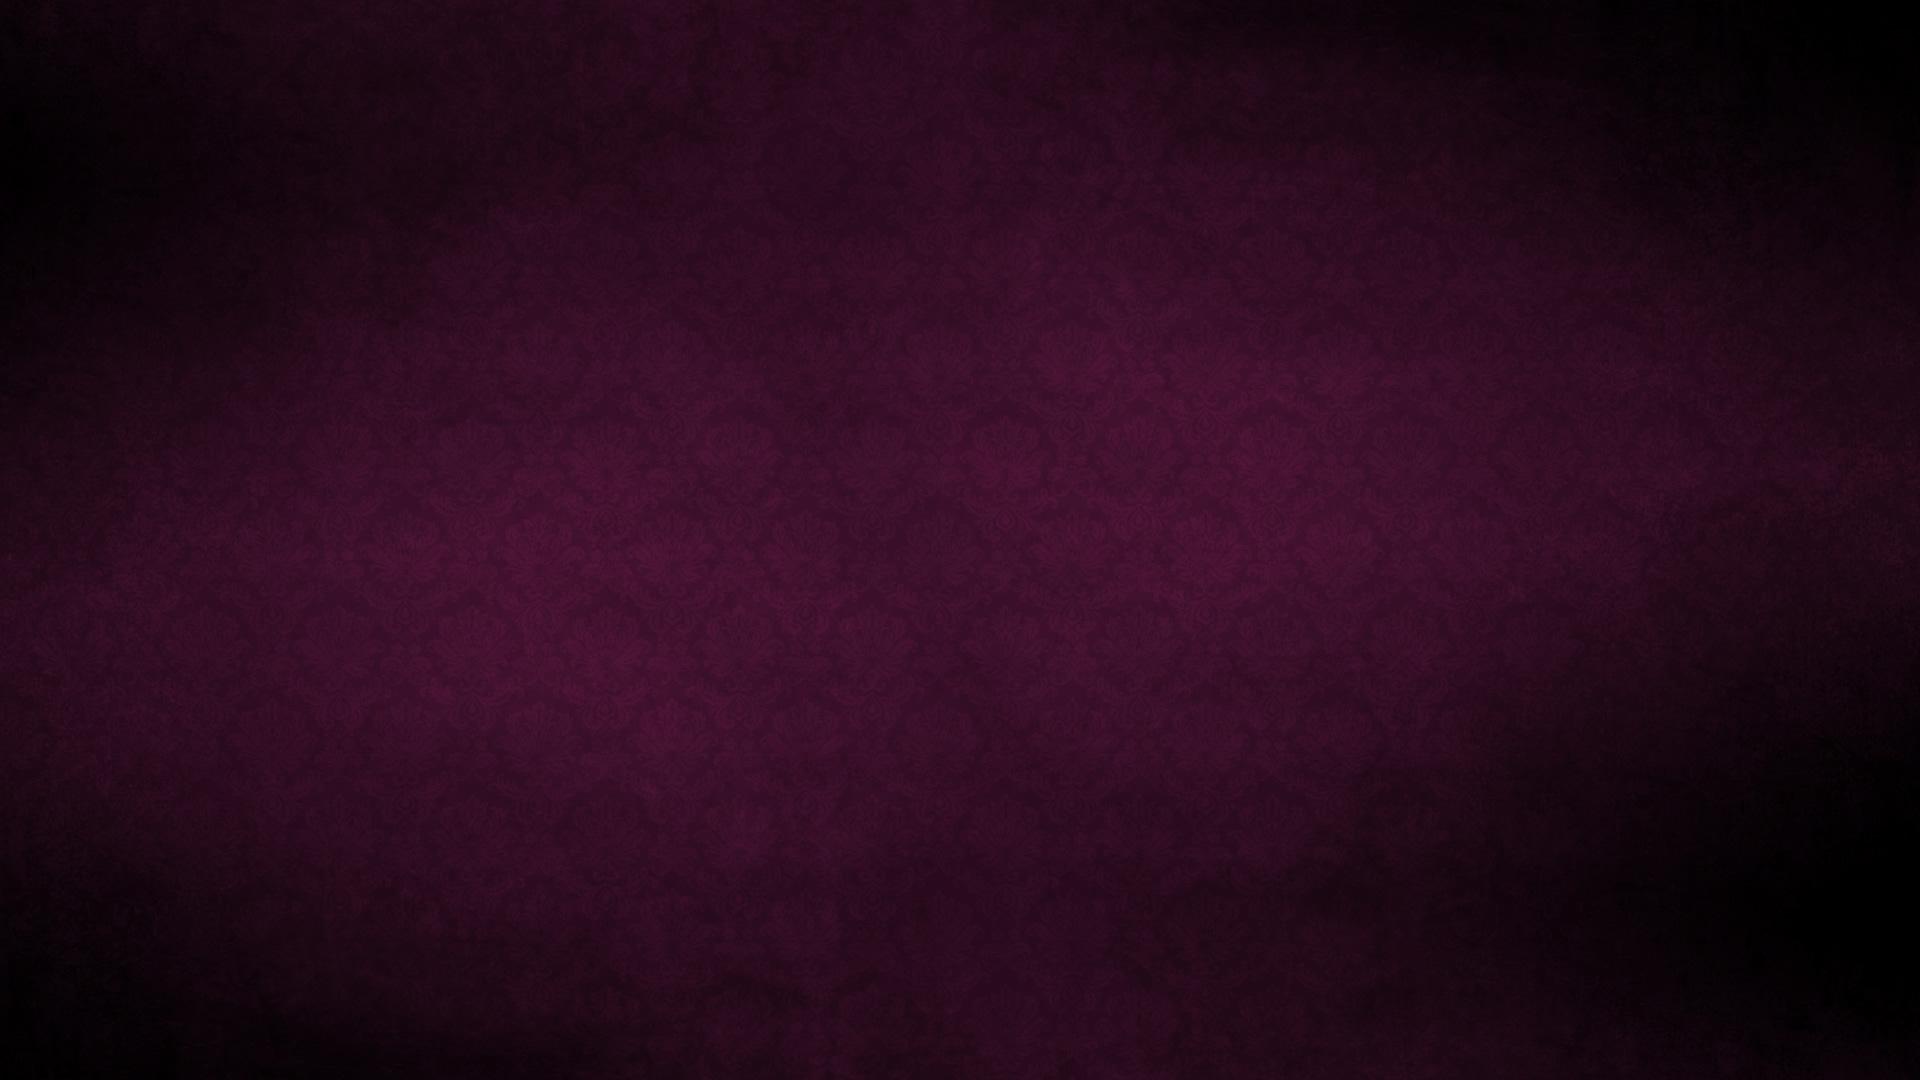 Plain Victorian Wallpaper 1920x1080 Plain Victorian Gothic Violet 1920x1080